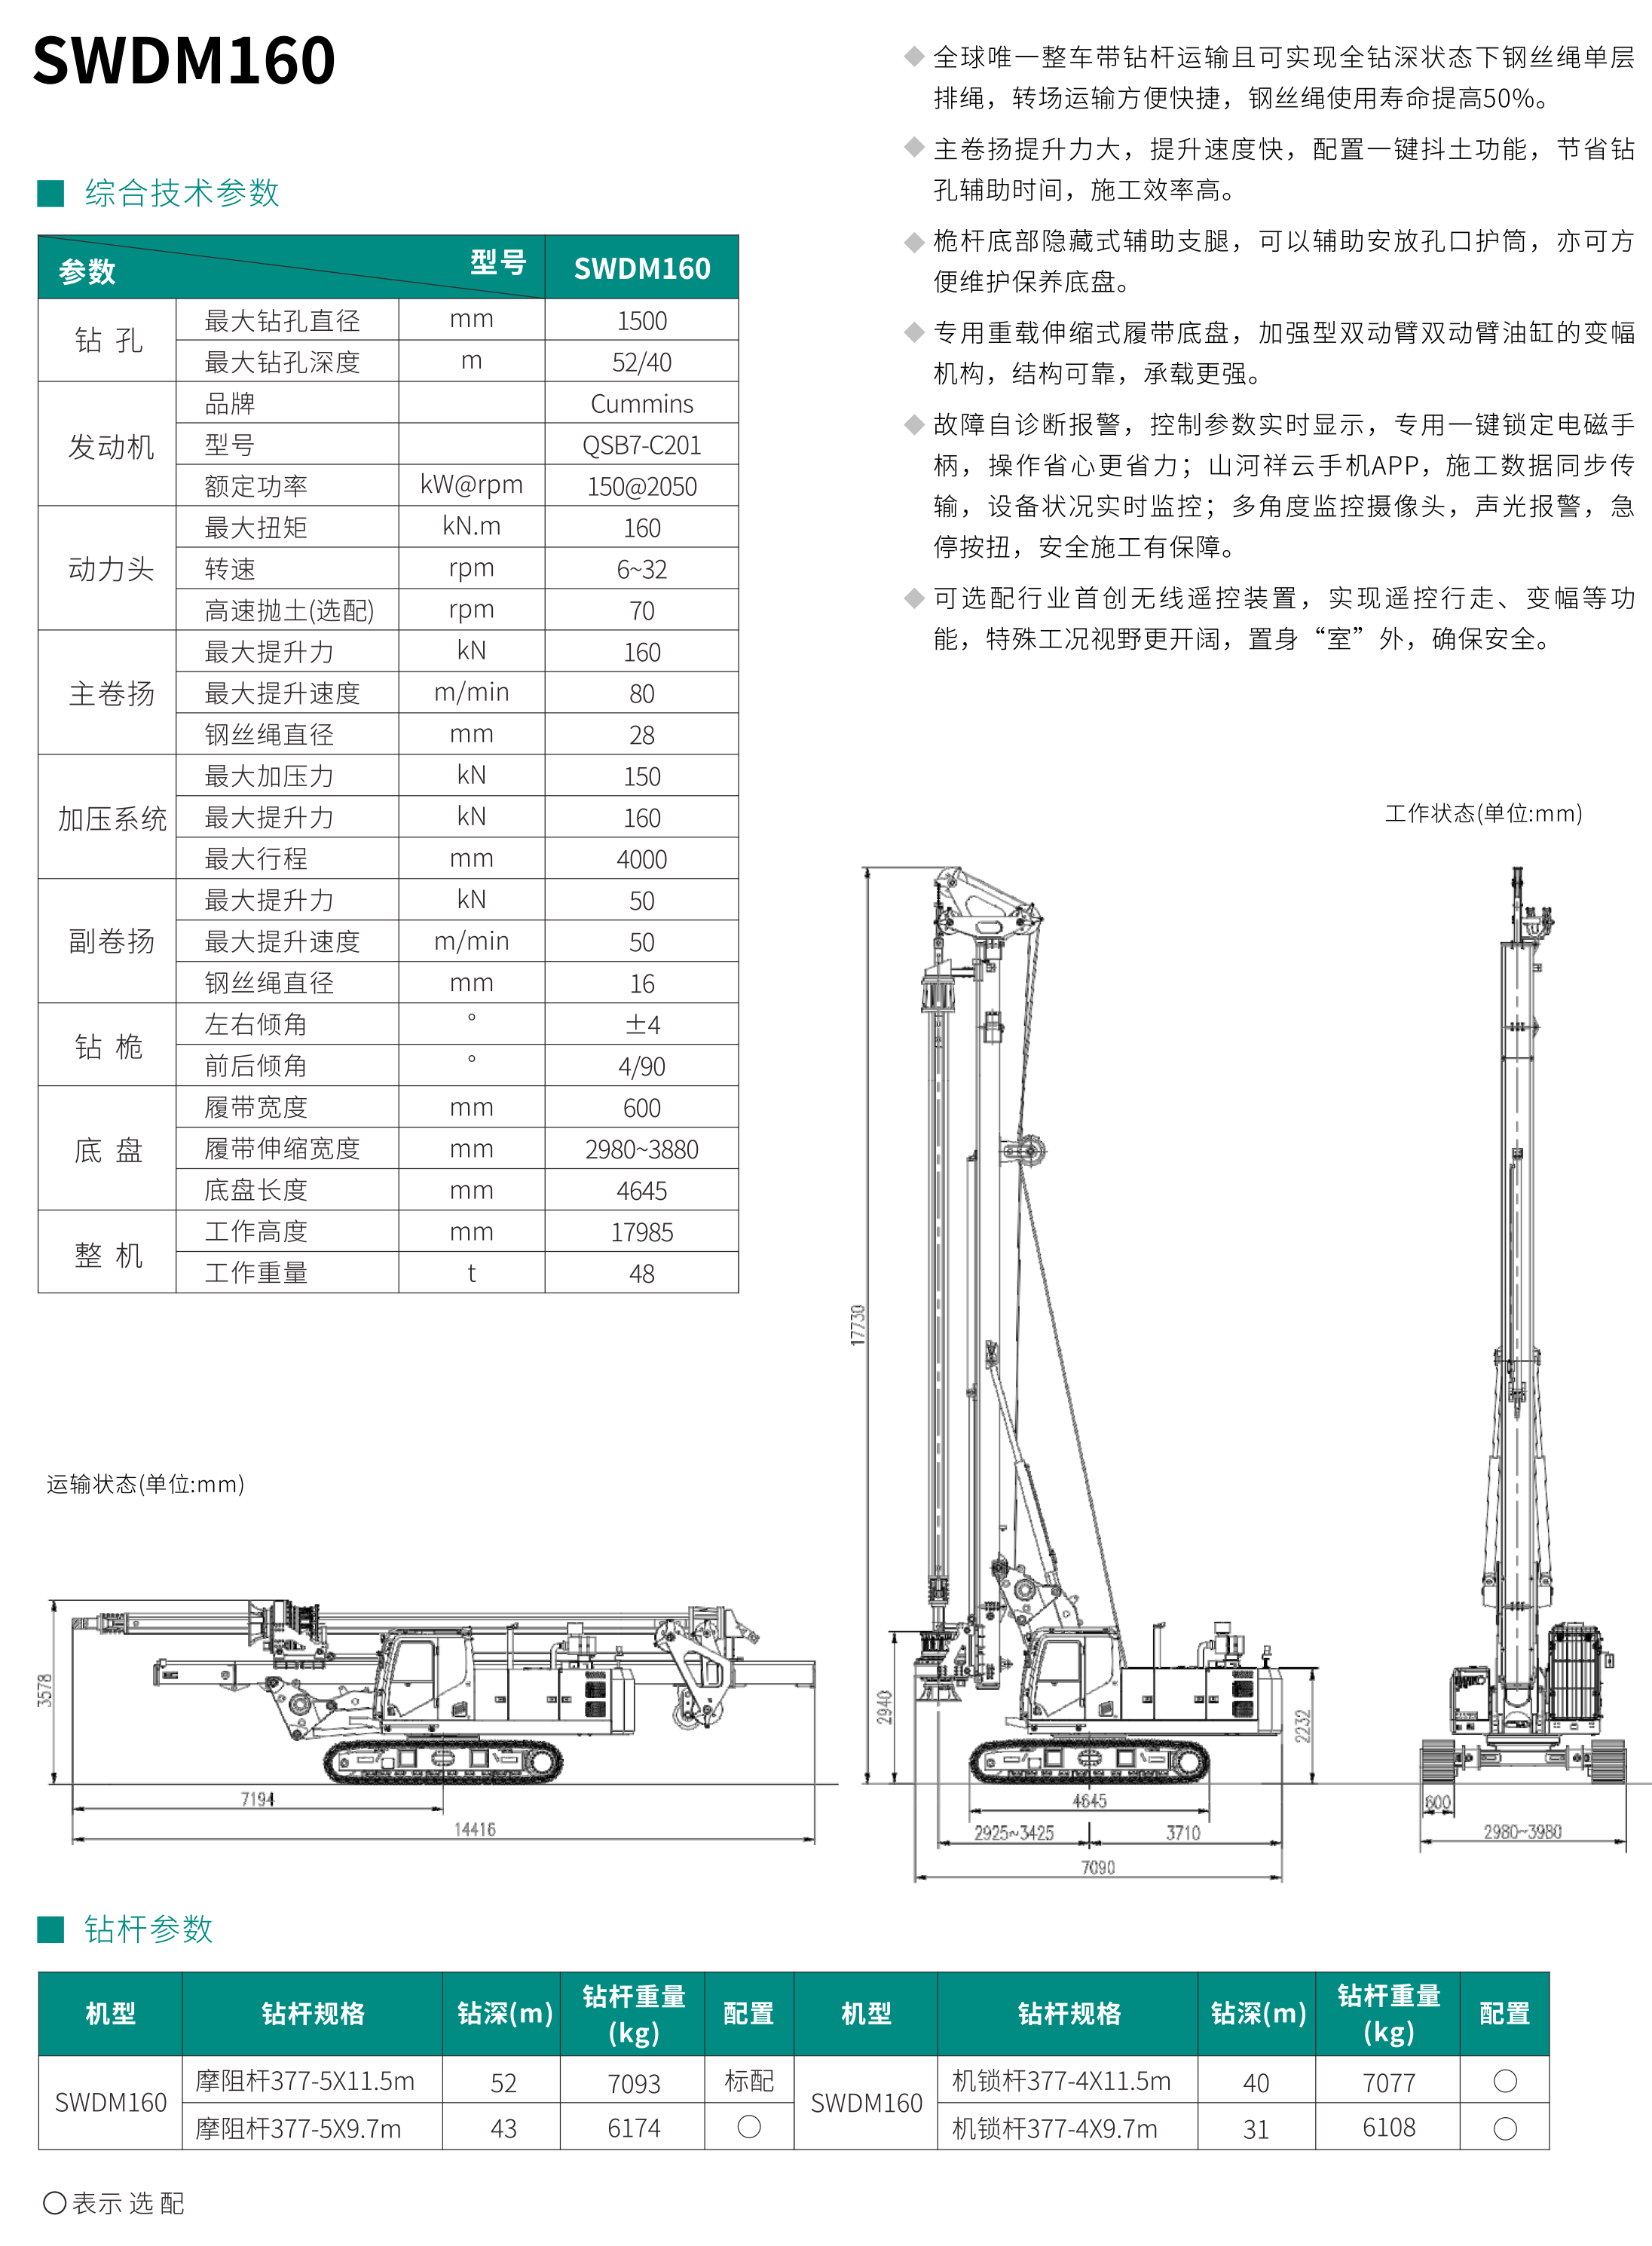 SWDM160 中型多功能旋挖钻机